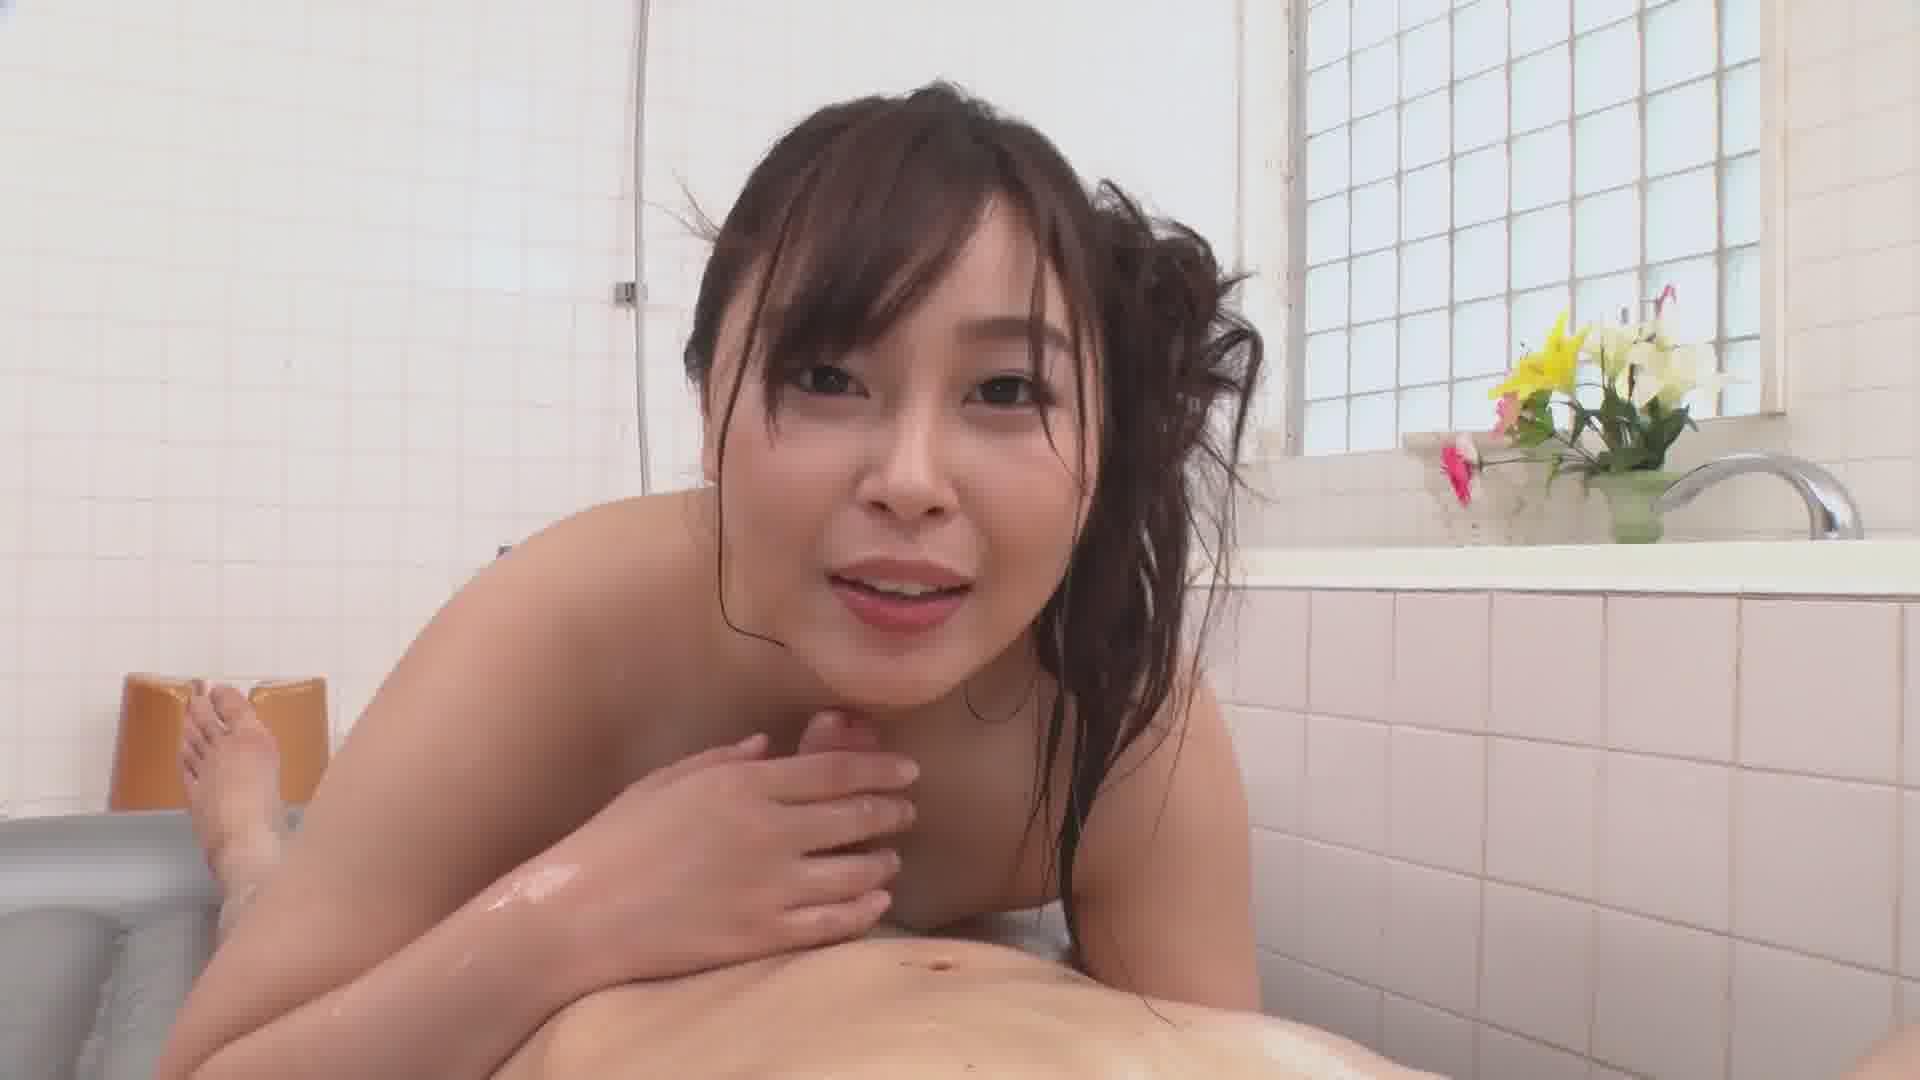 極上泡姫物語 Vol.72 - 小川桃果【巨乳・パイズリ・隠語】